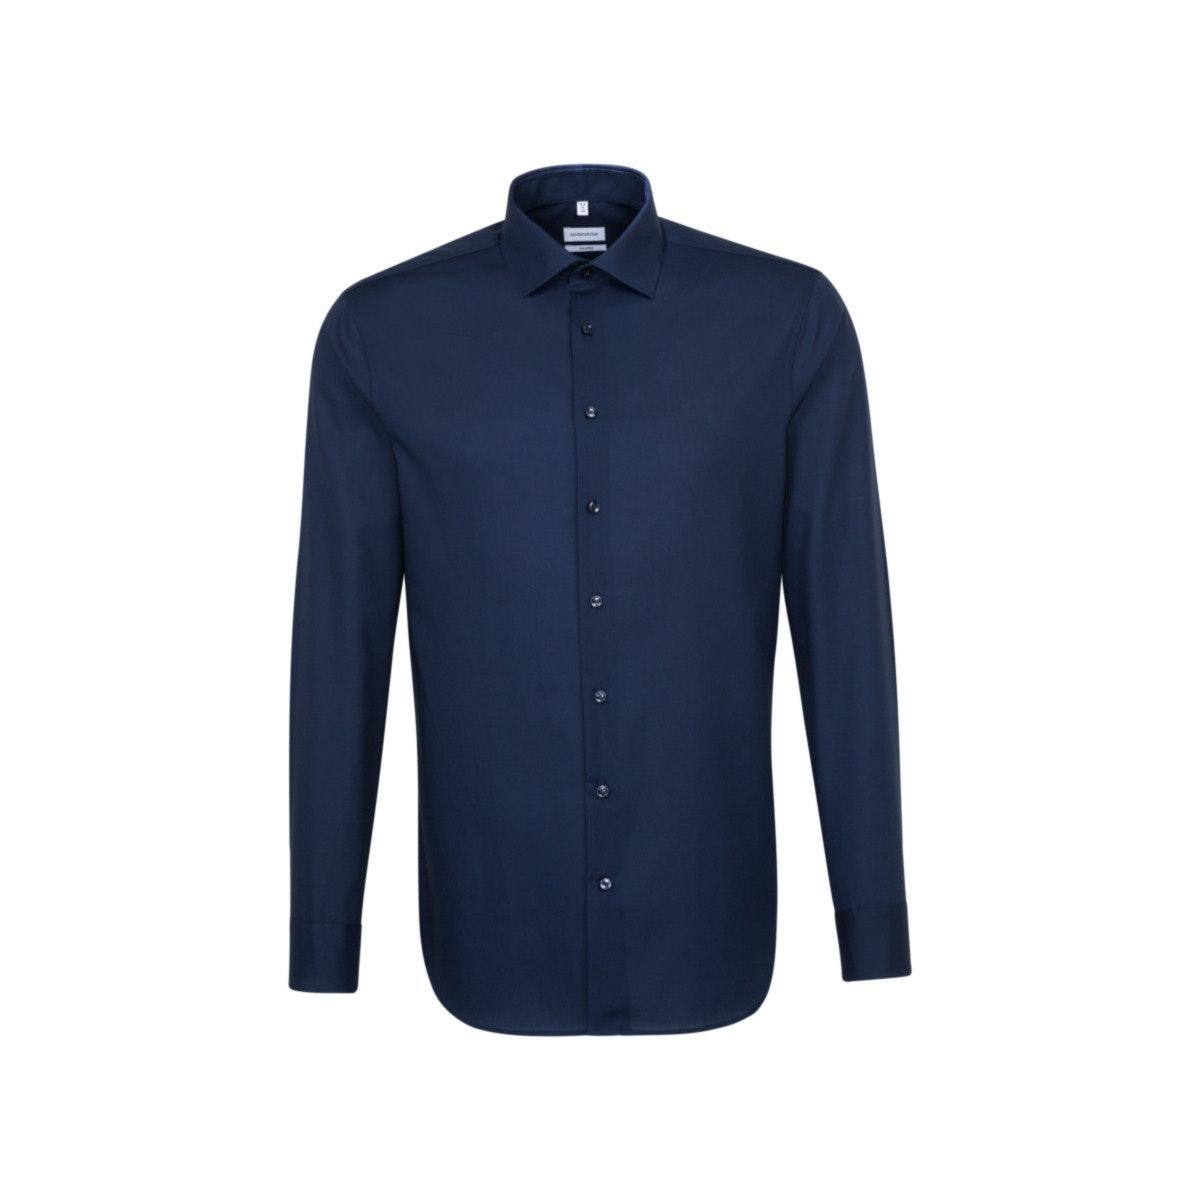 seidensticker-hemd-01-021000-19-blau-frontF47ytXIj5tFWT